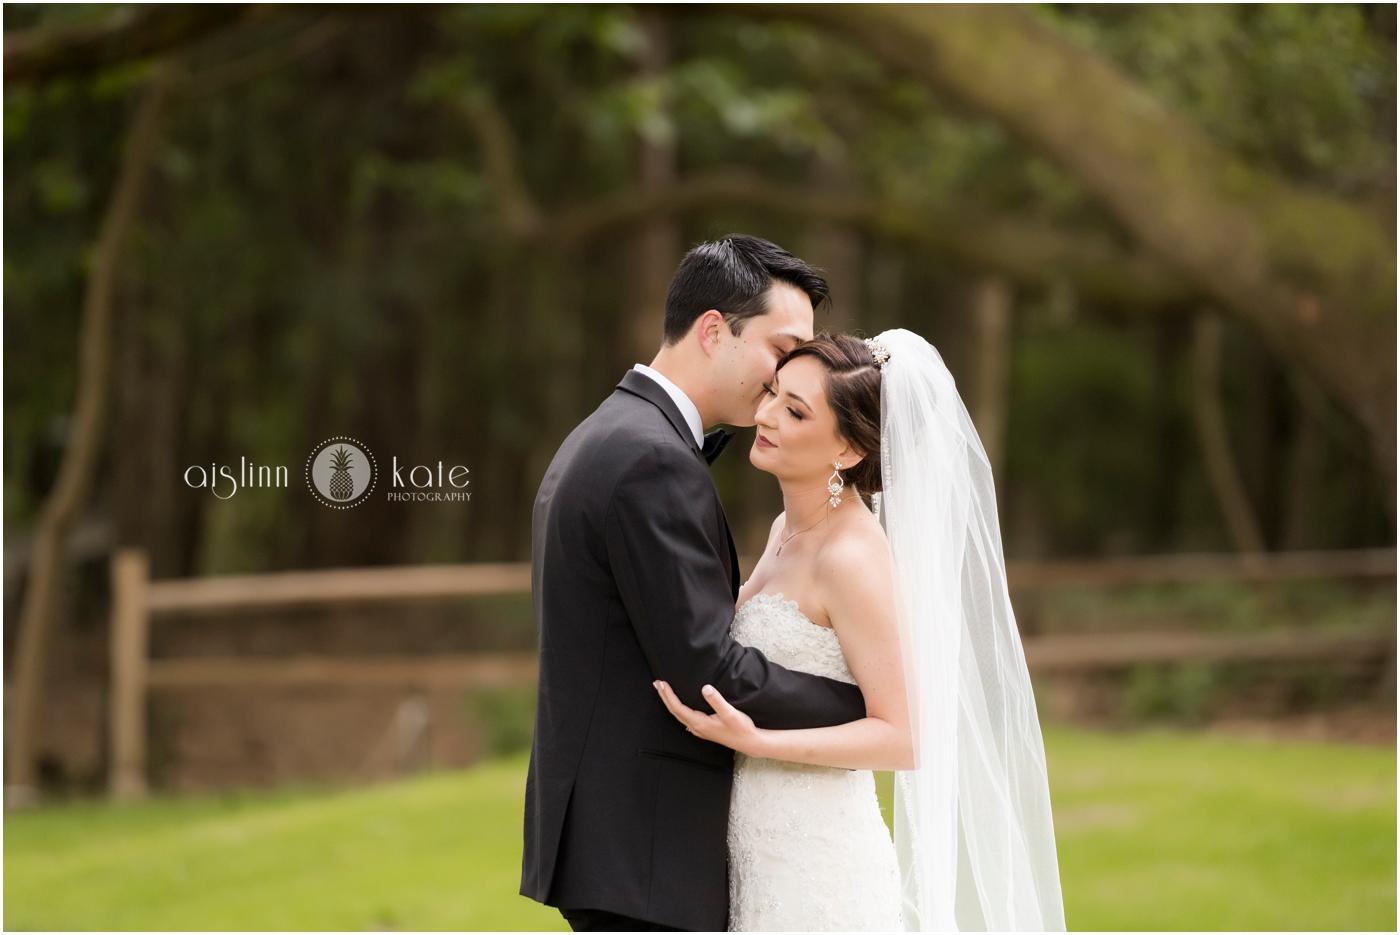 Pensacola-Destin-Wedding-Photographer_2496.jpg